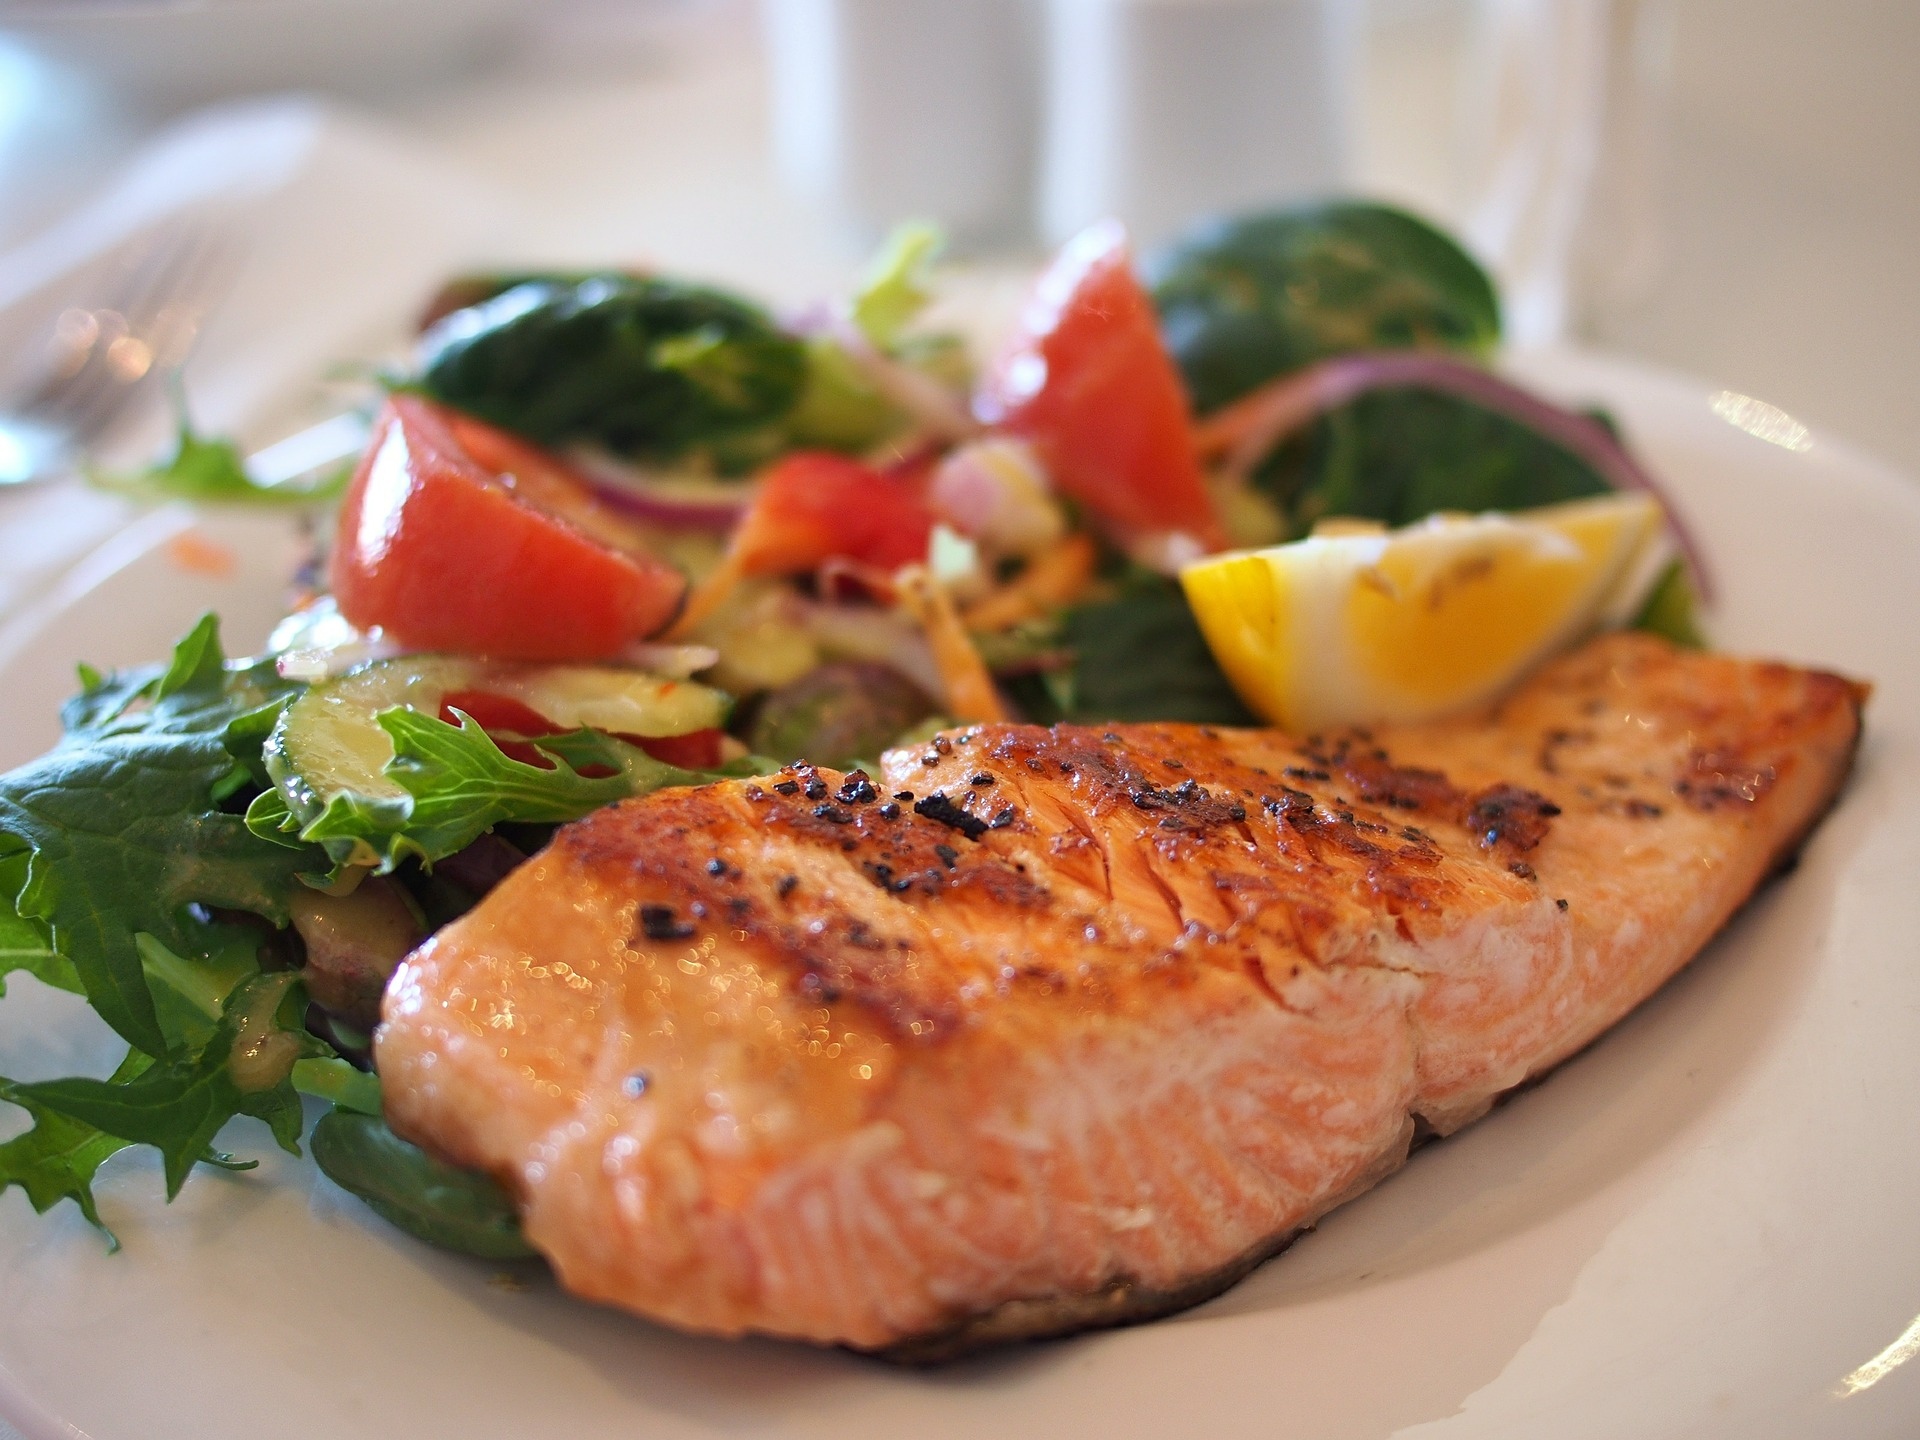 Fish high in vitamin D